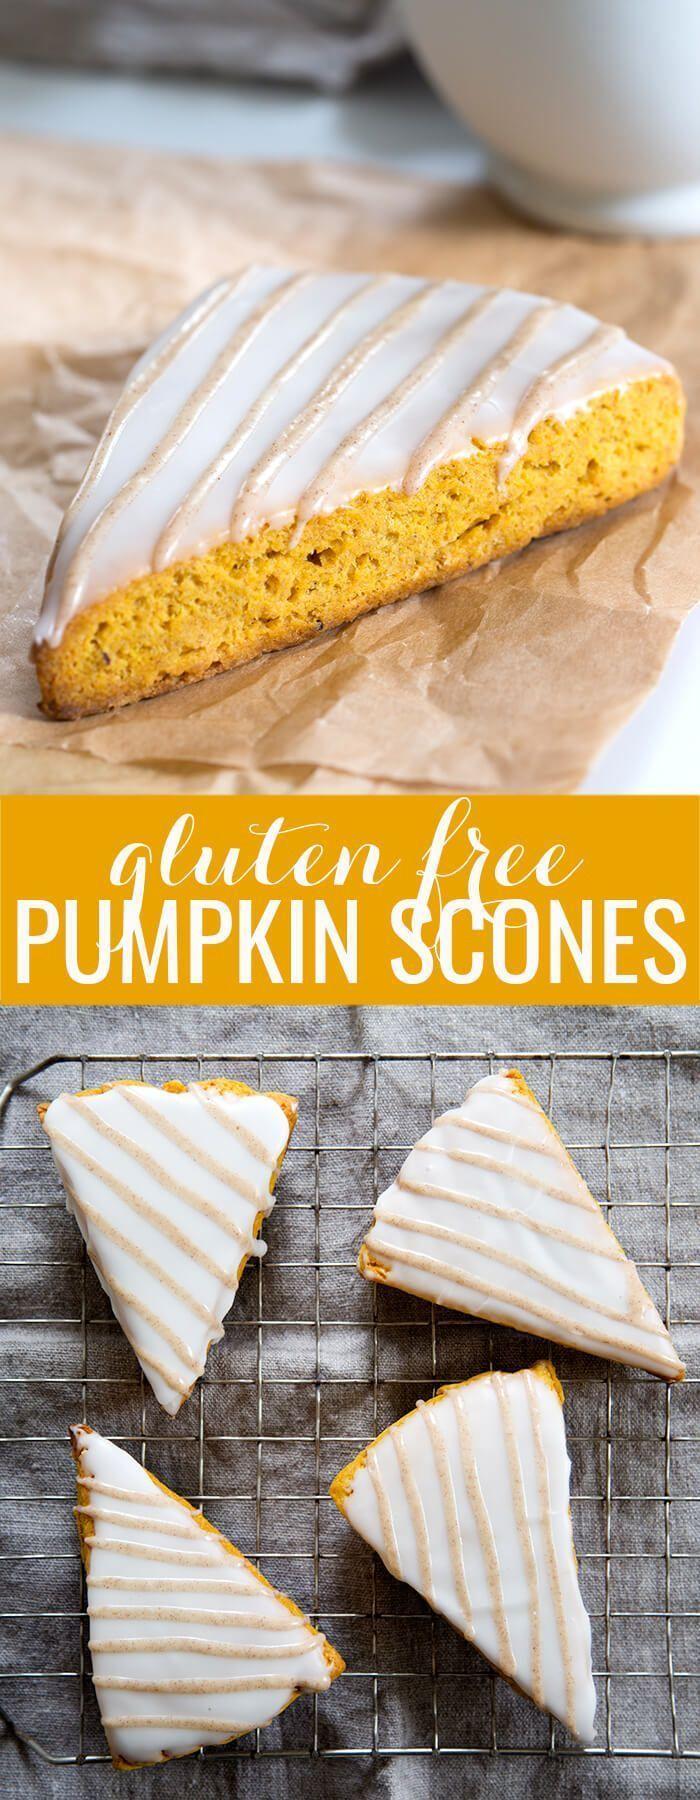 Iced Gluten Free Pumpkin Scones—Perfect For Fall Gluten